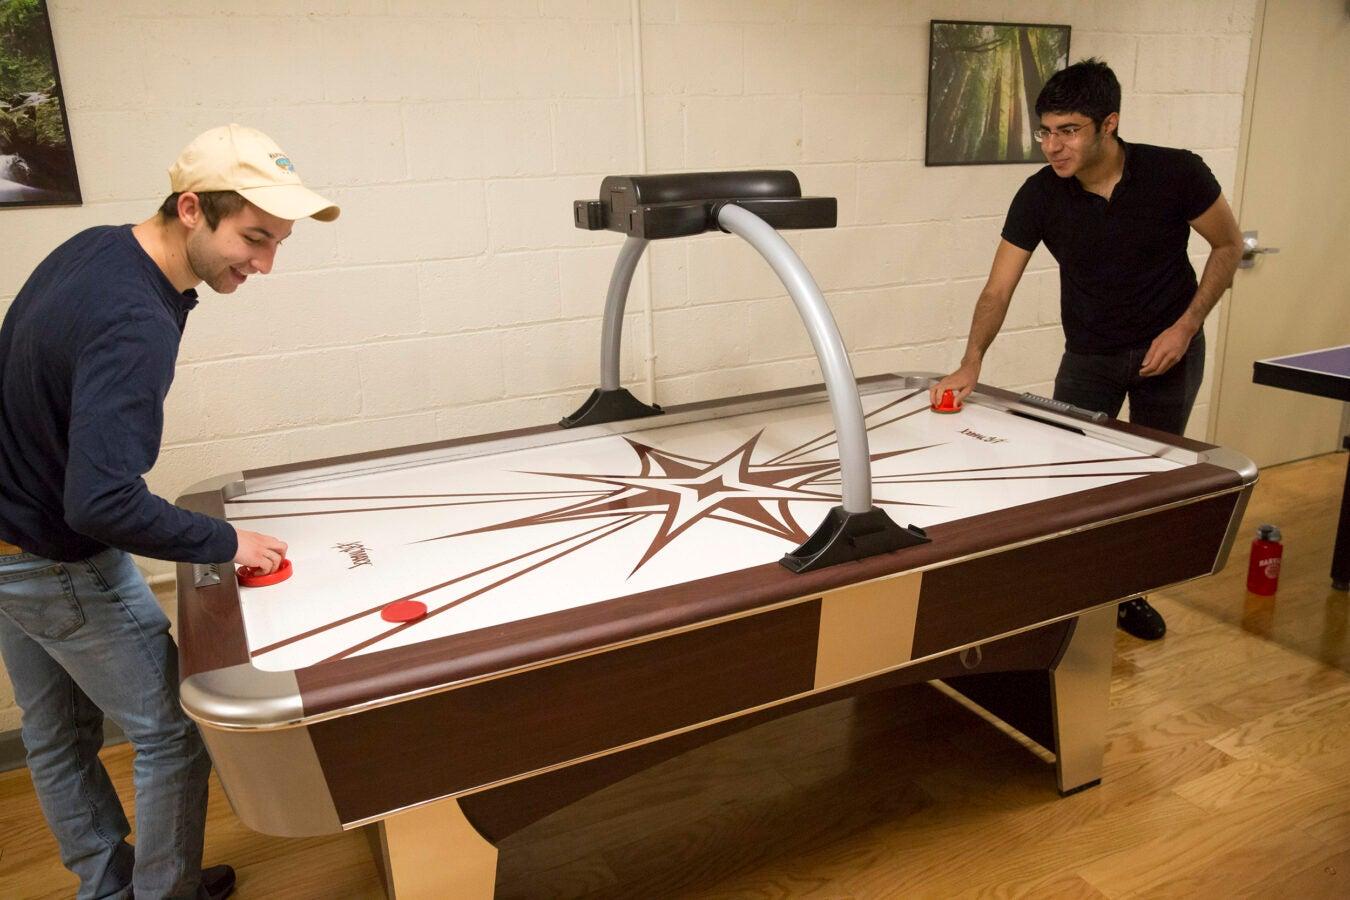 Roommates in Wigglesworth: Scott Kall '20 (MA), left, plays air hockey with Soheil Sadabadi '20 (Iran).